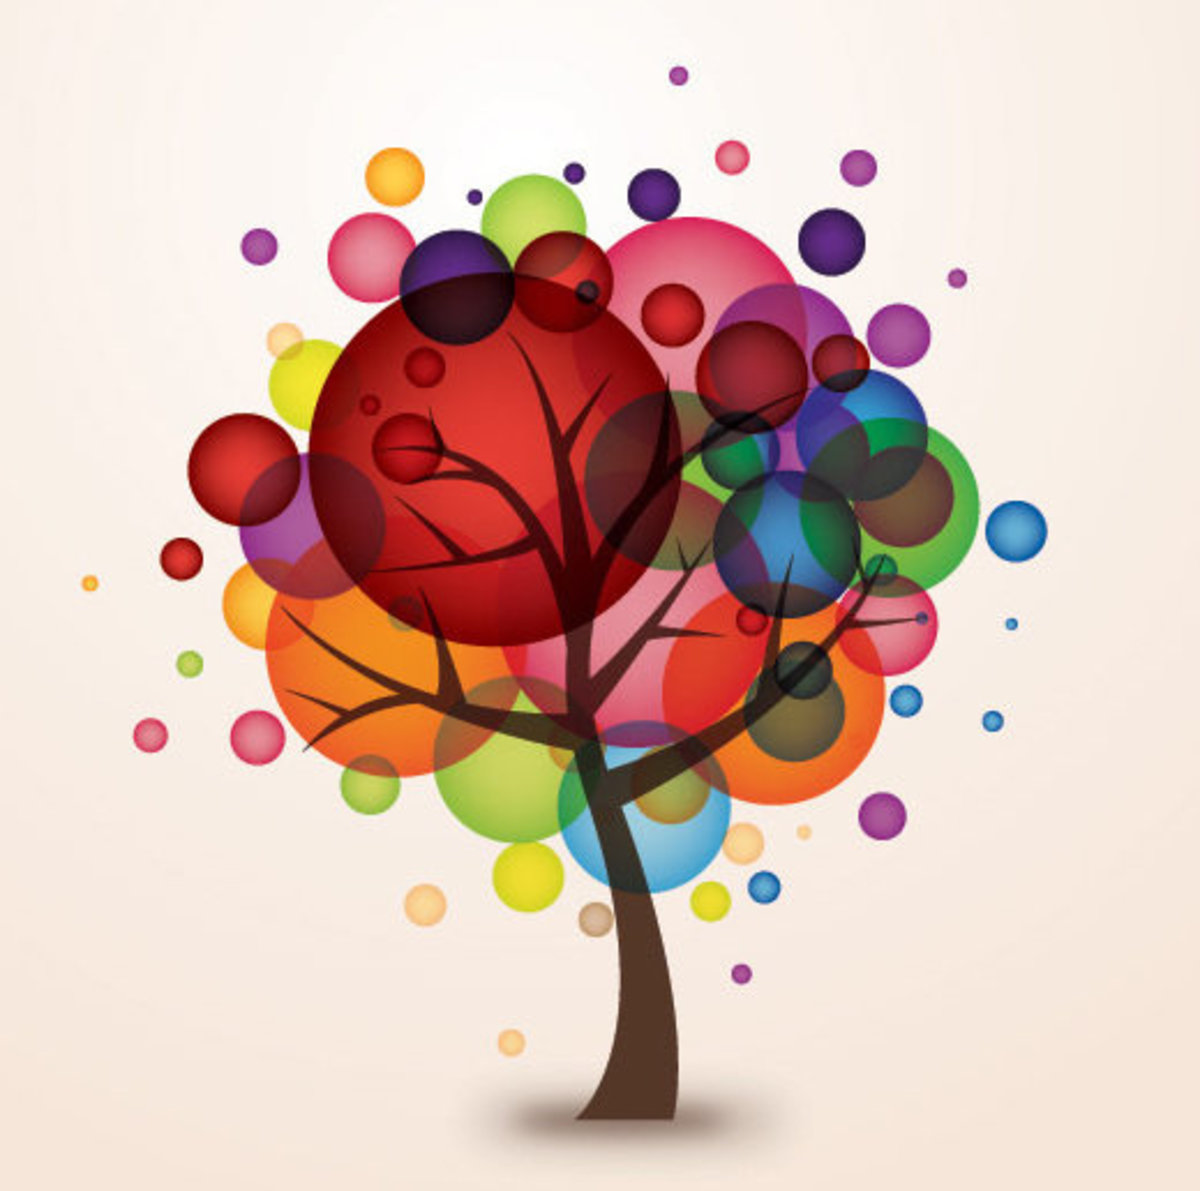 Tree of Bubbles